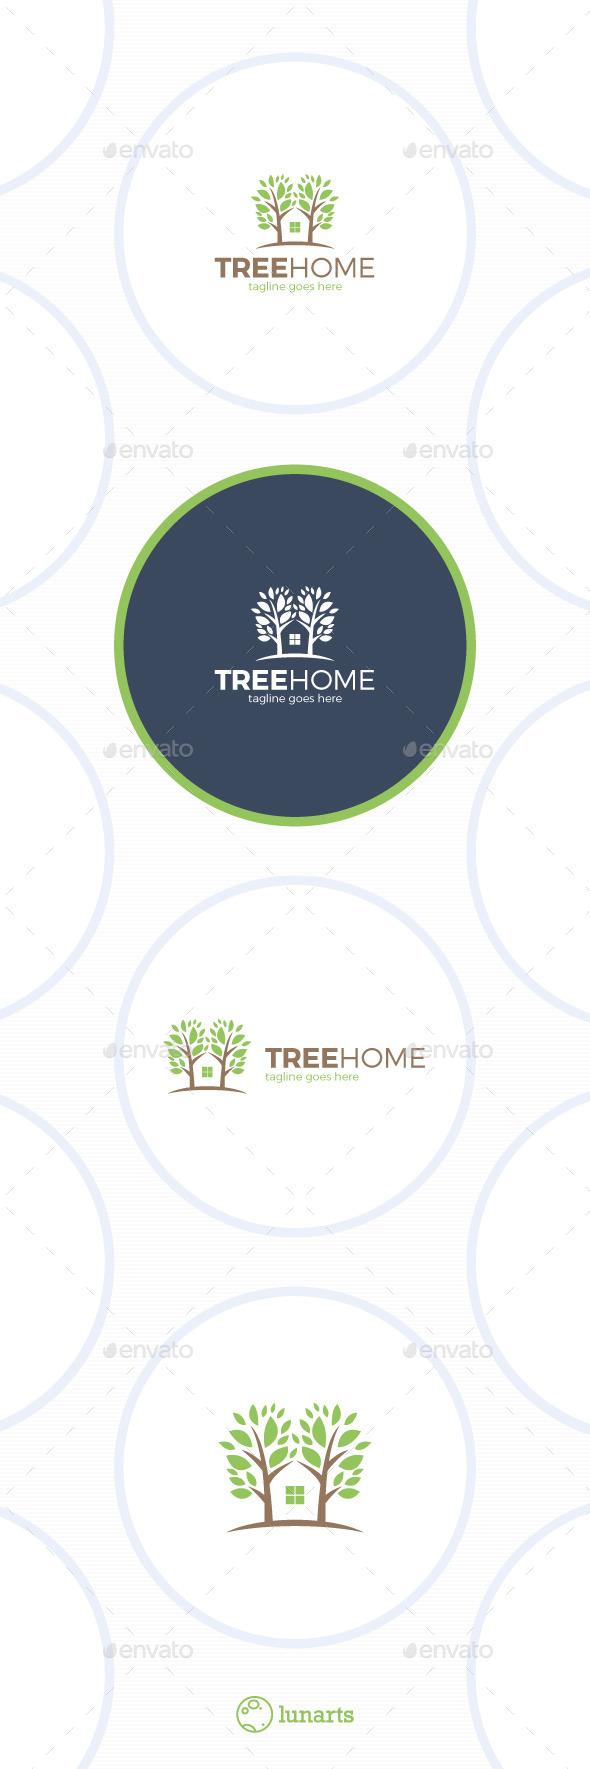 Tree Home Logo - Eco House - Nature Logo Templates